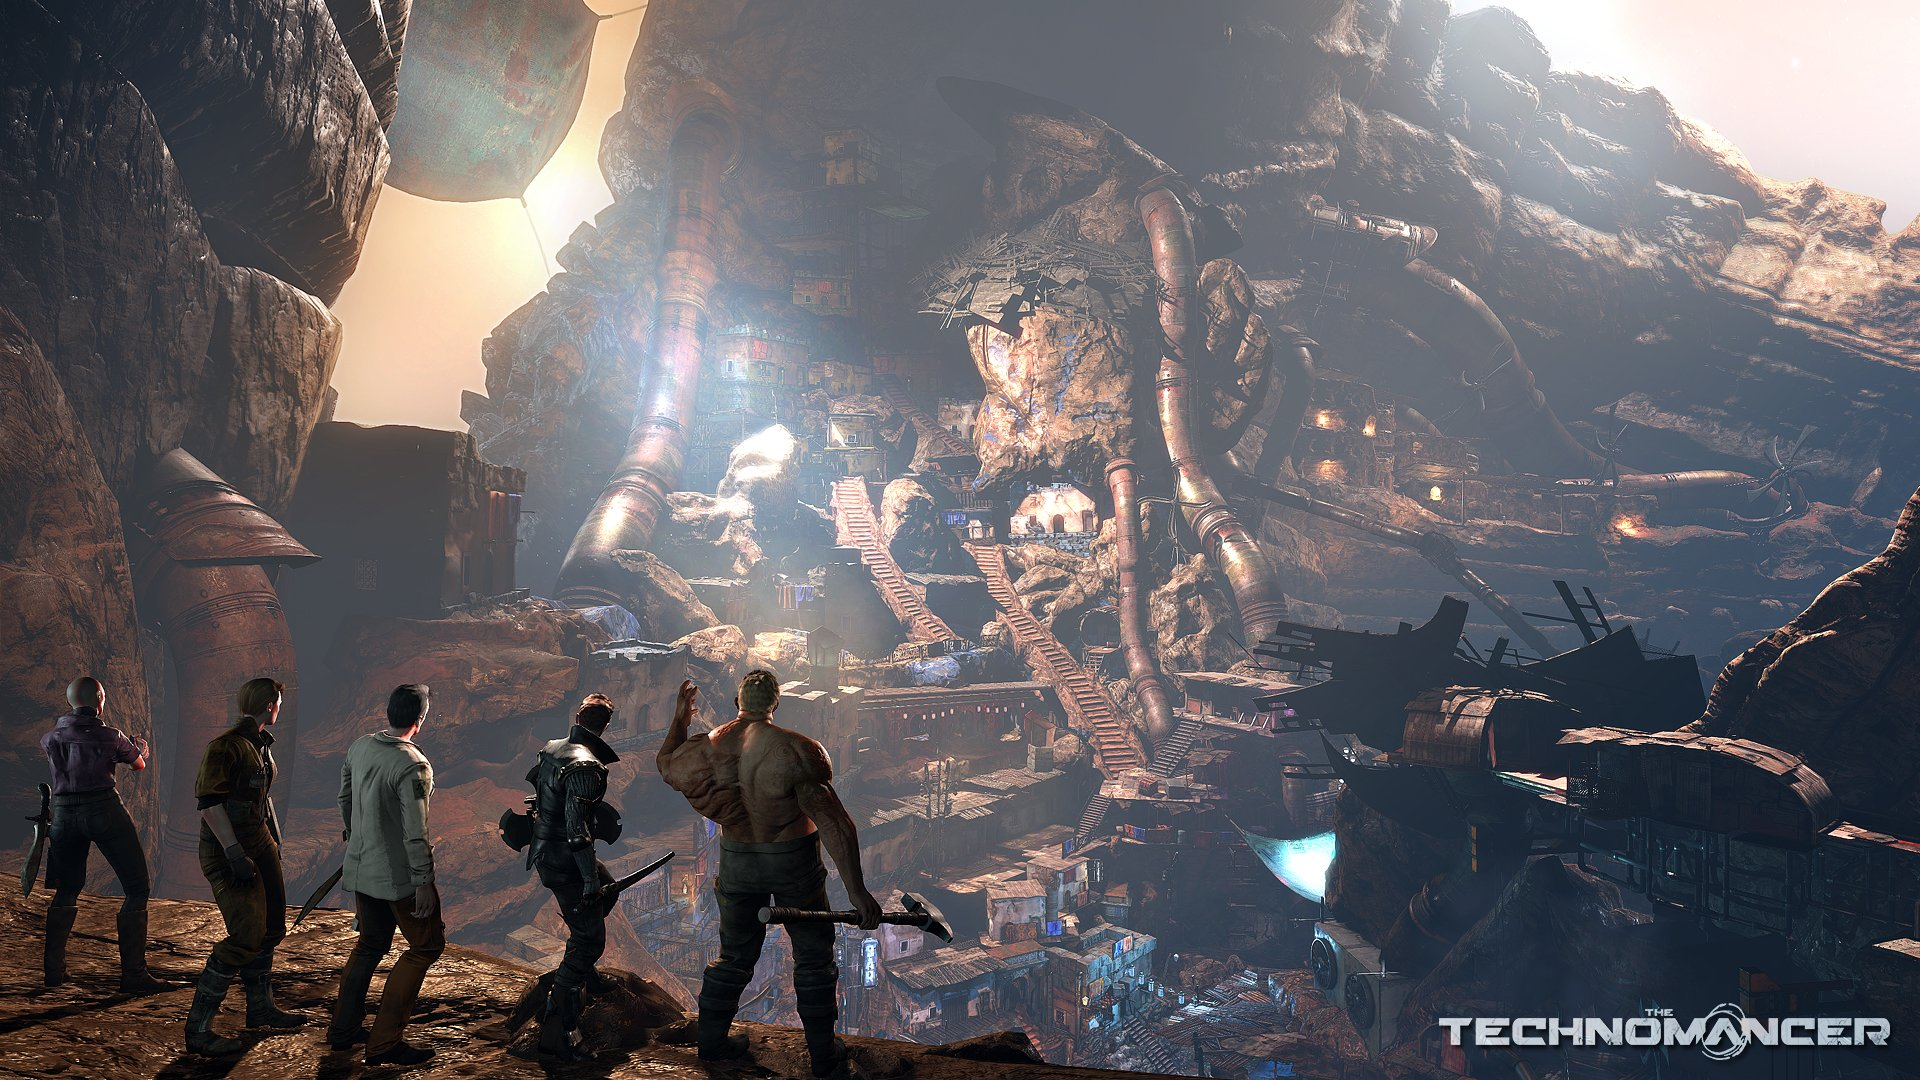 The Technomancer Screenshots ~ PS4, Xbox One & PC - Изображение 1